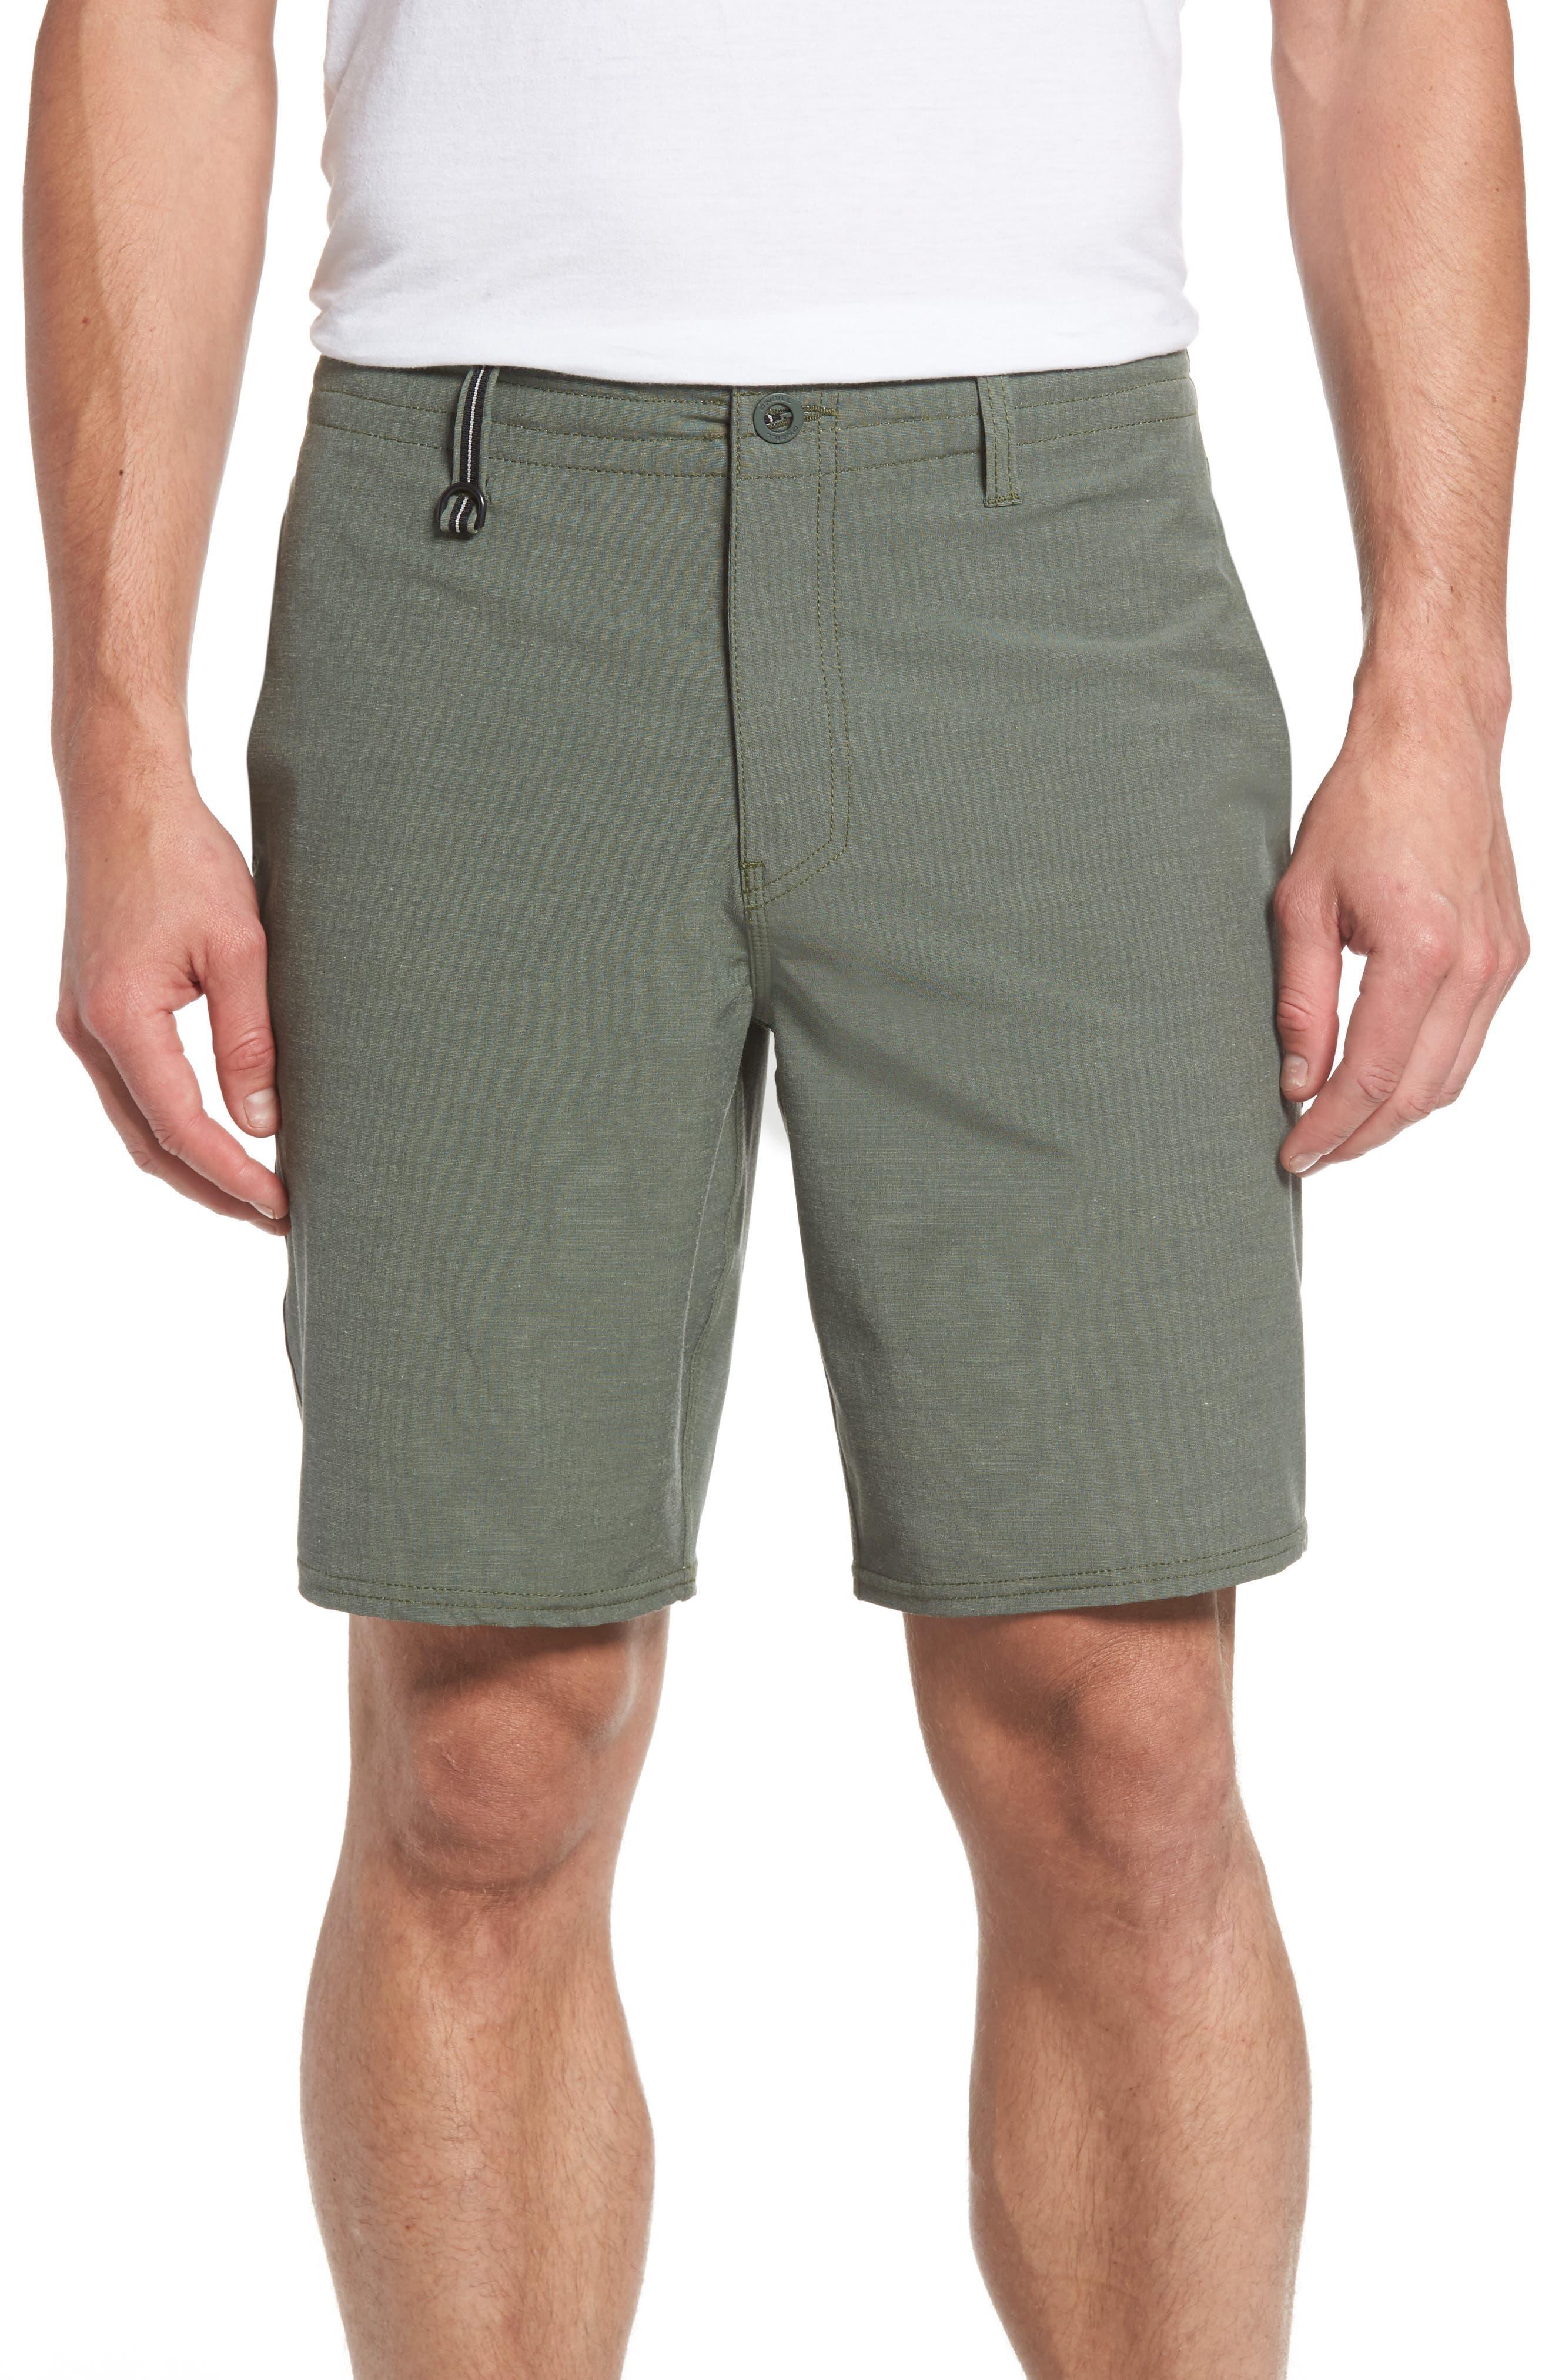 O'Neill Traveler Recon Hybrid Shorts